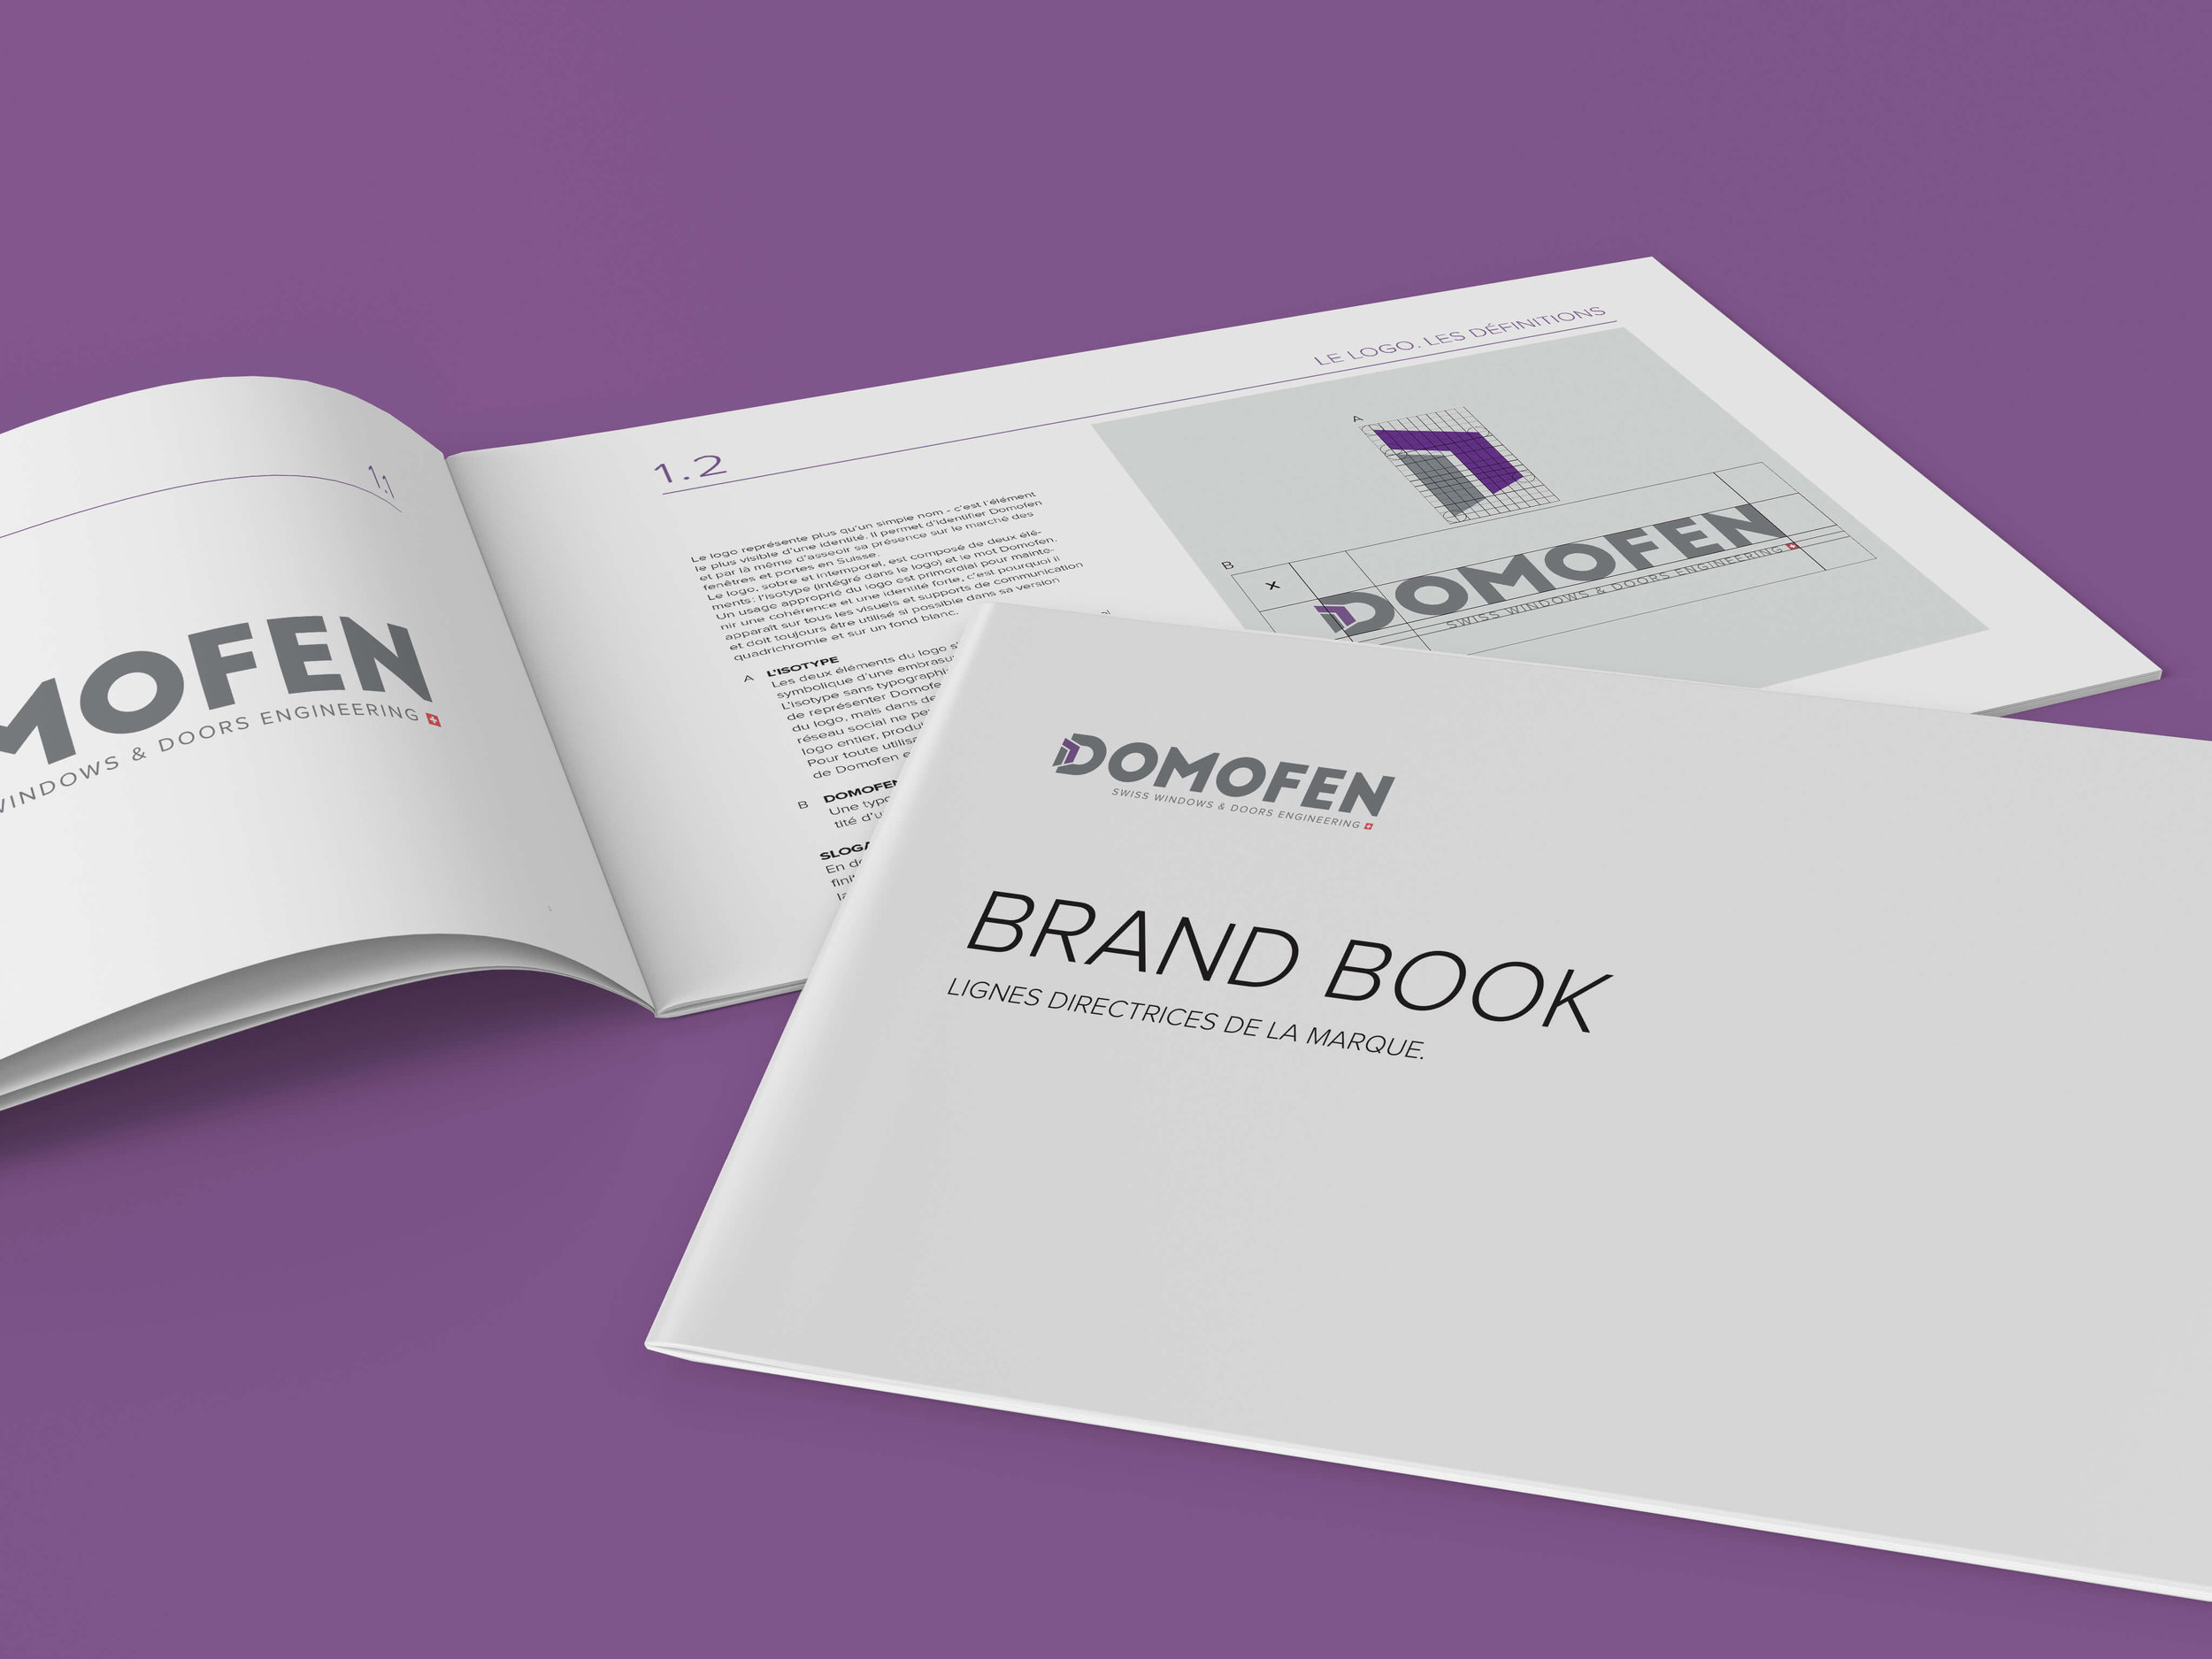 DOMO_Brandbook_visual.jpg